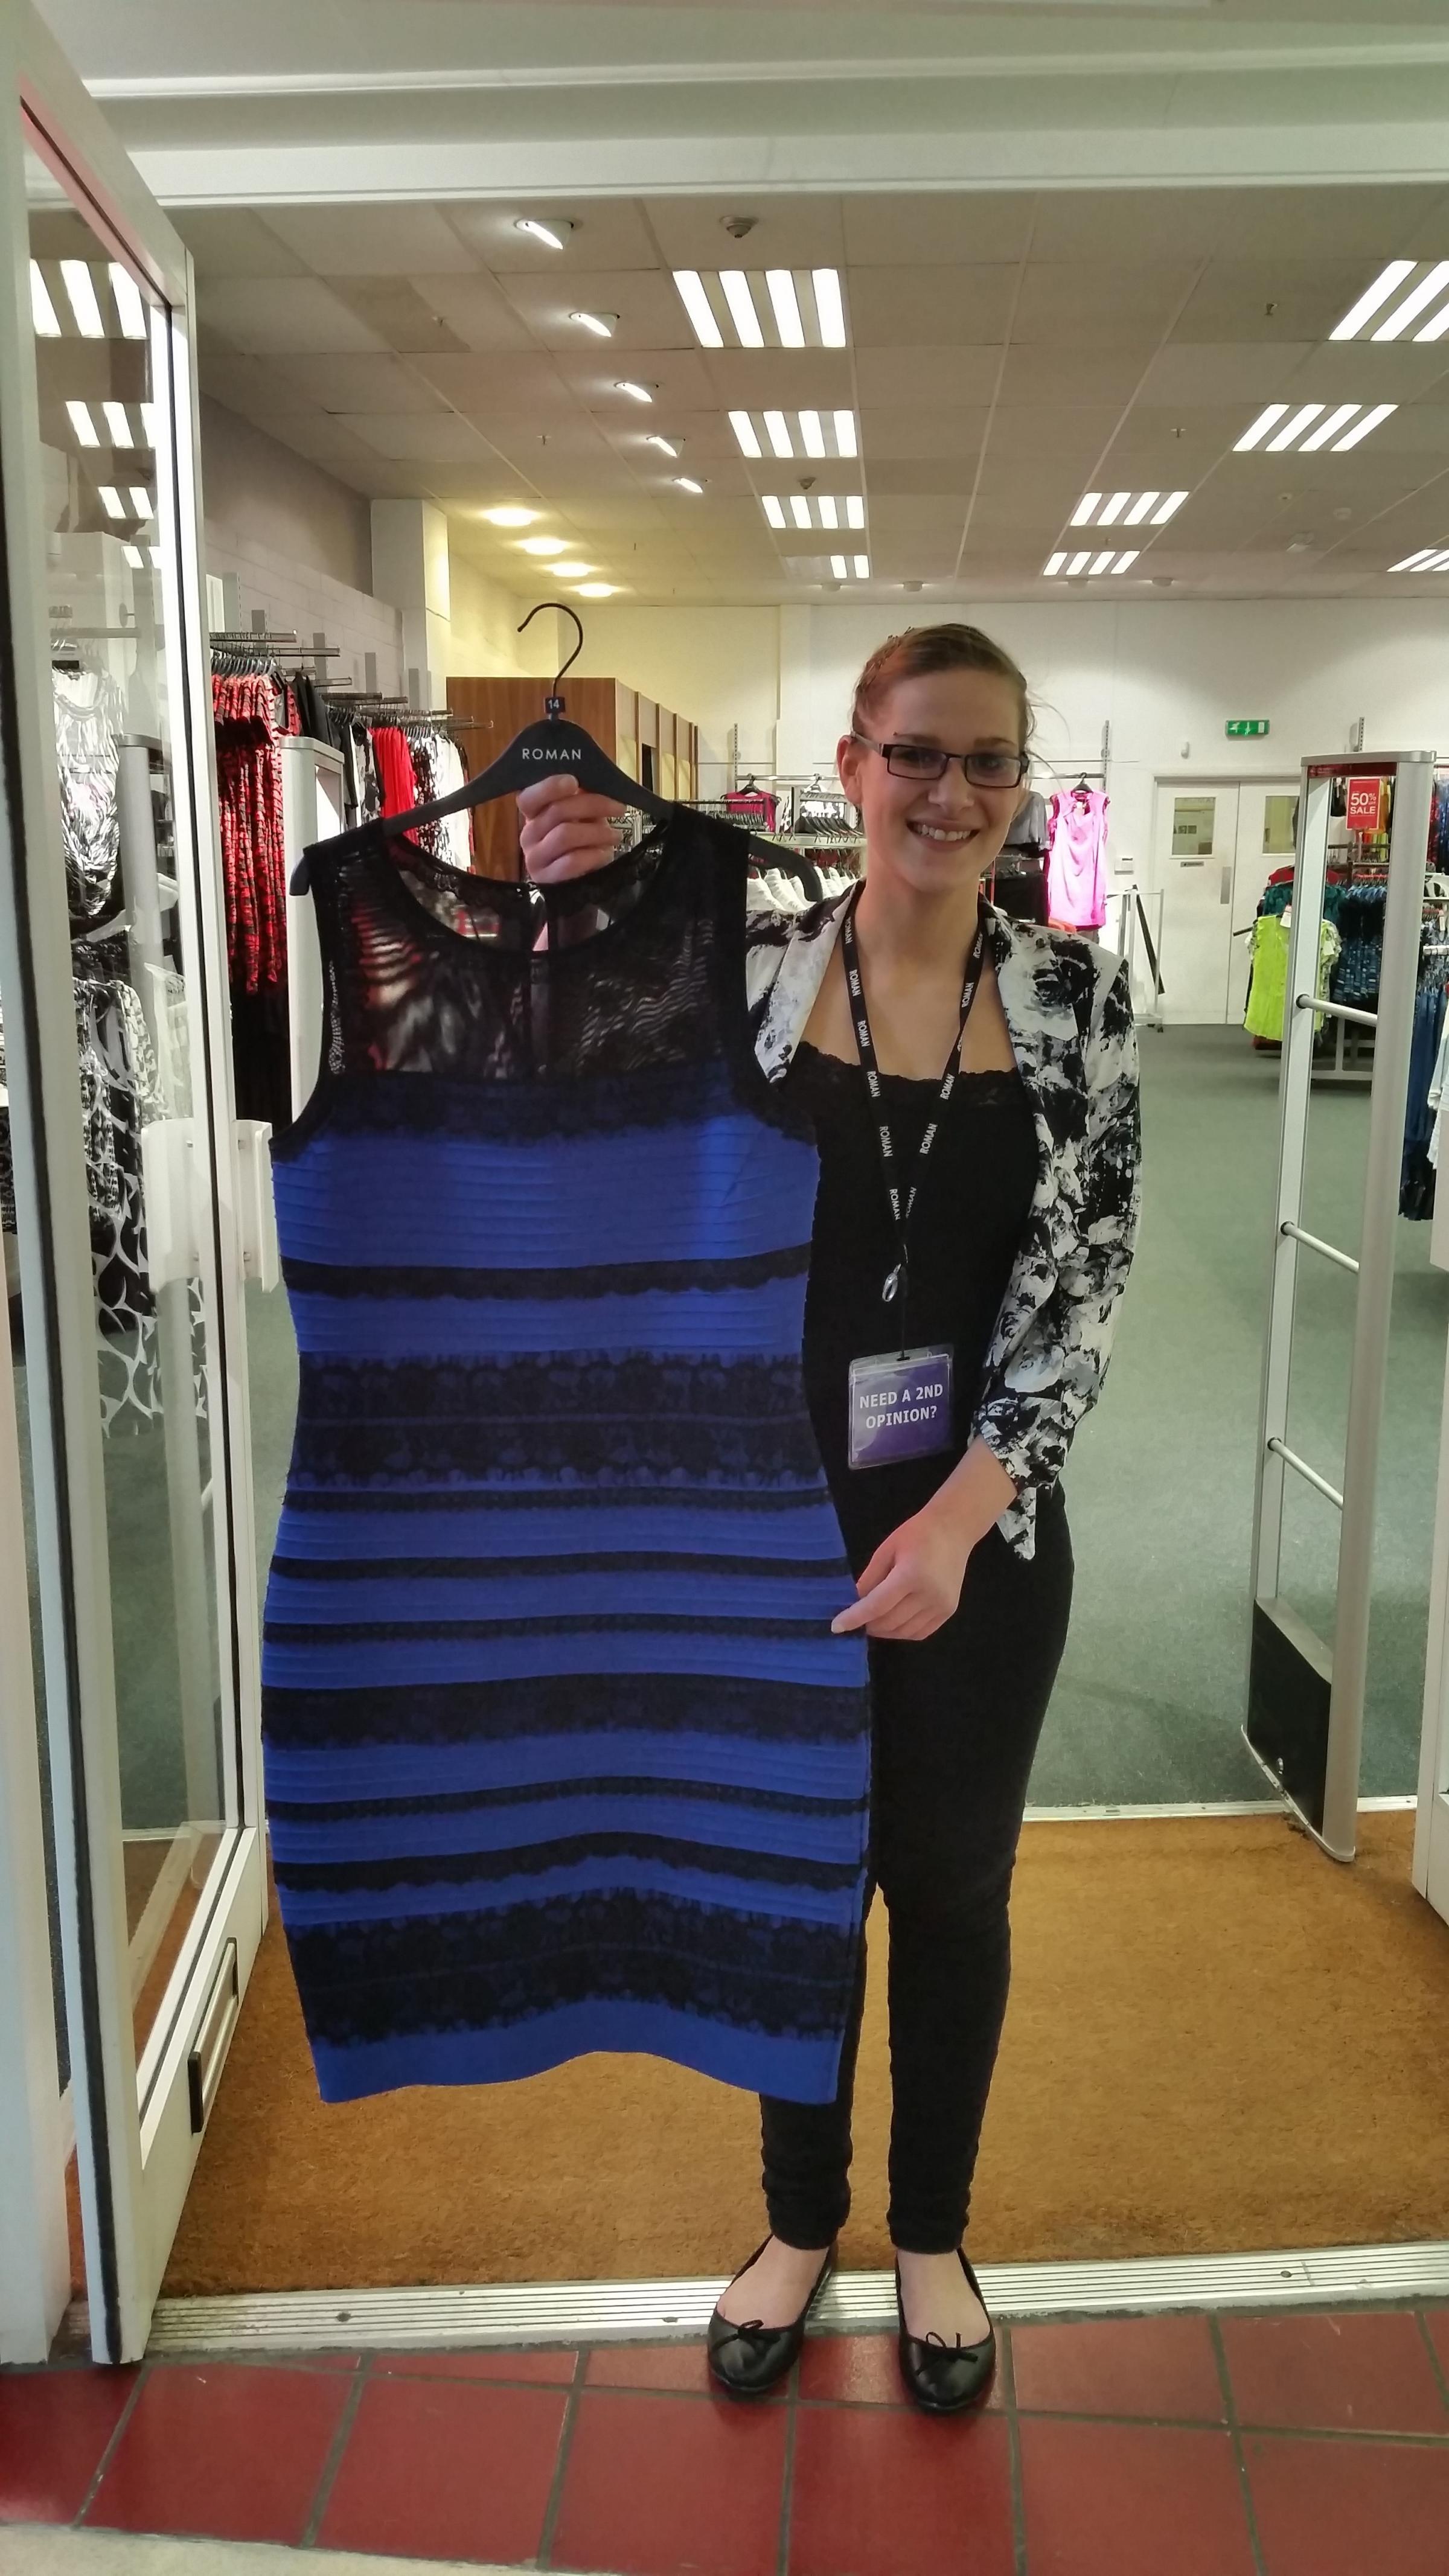 The dress broke internet - Orpington Roman Originals Shop Enjoys Stampede Of Sales After Viral Dress Photo From News Shopper